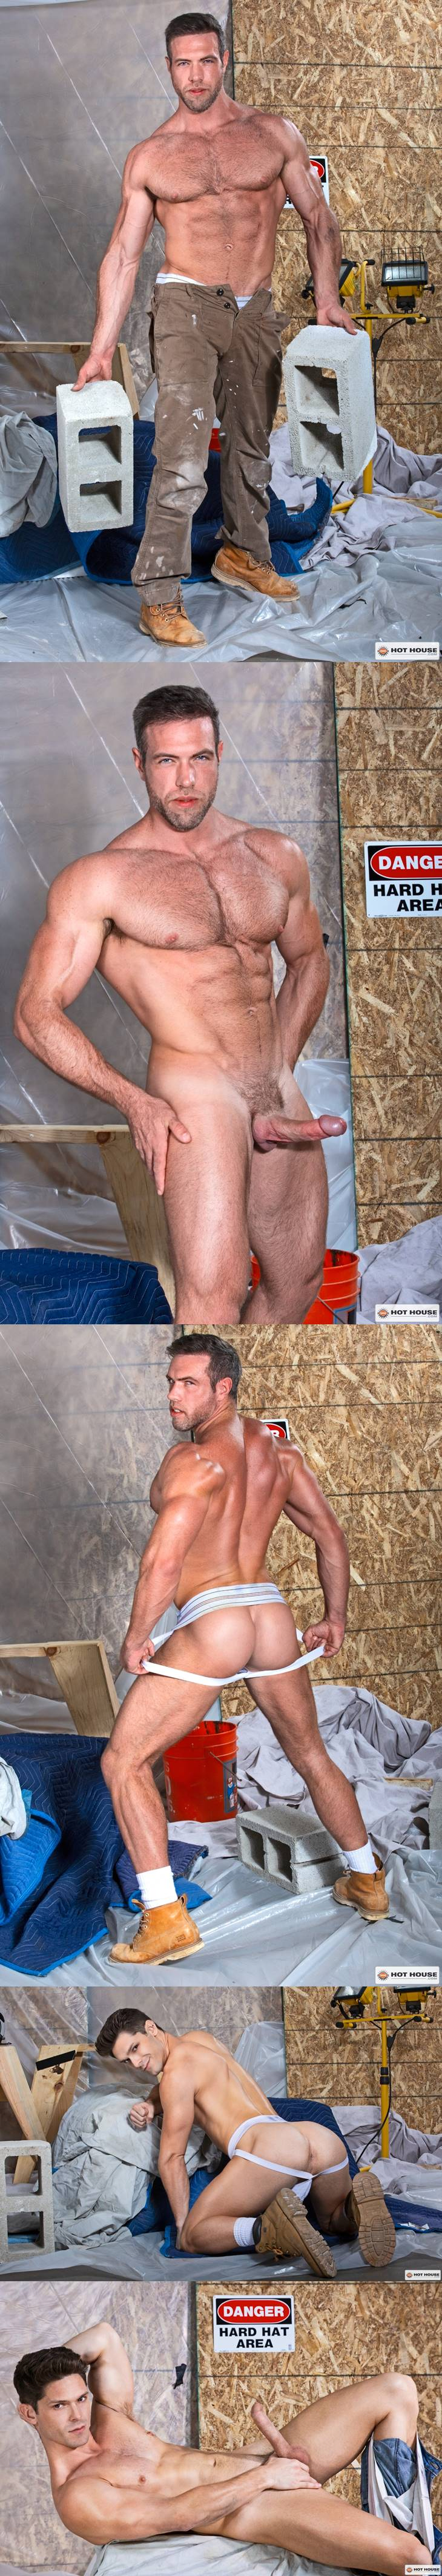 Hot House - The Foreman's Son: Alex Mecum & Devin Franco